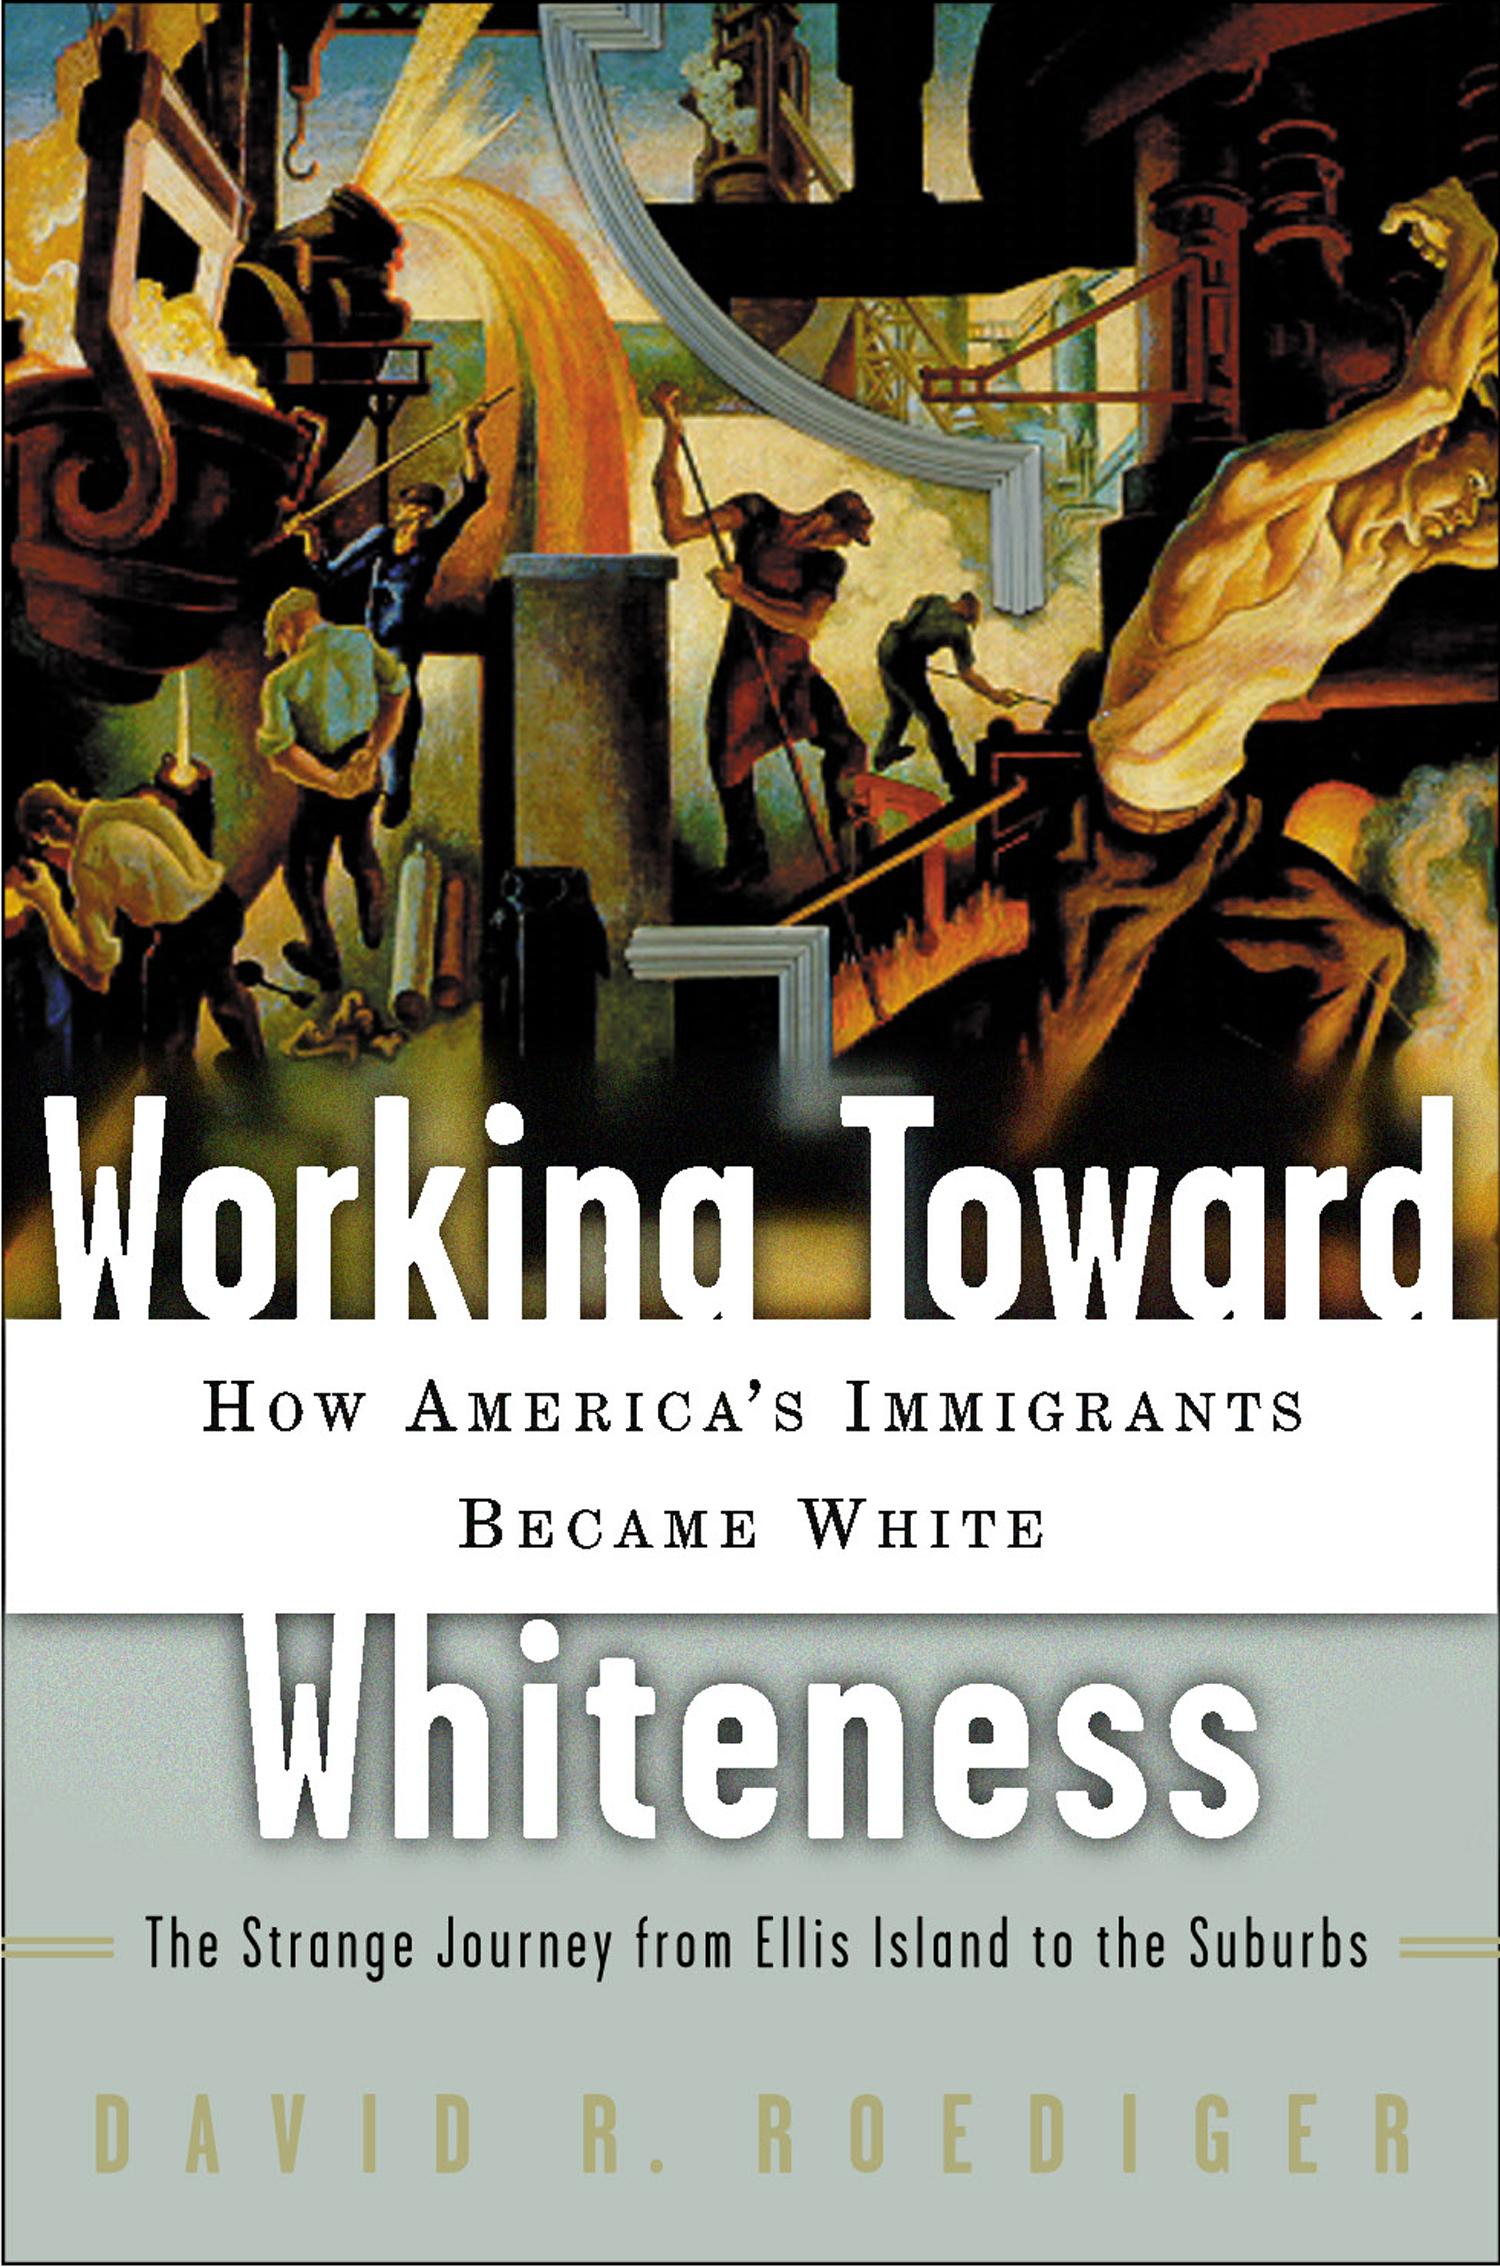 WORKING-TOWARD-WHITENESS-lo-ss6.jpg